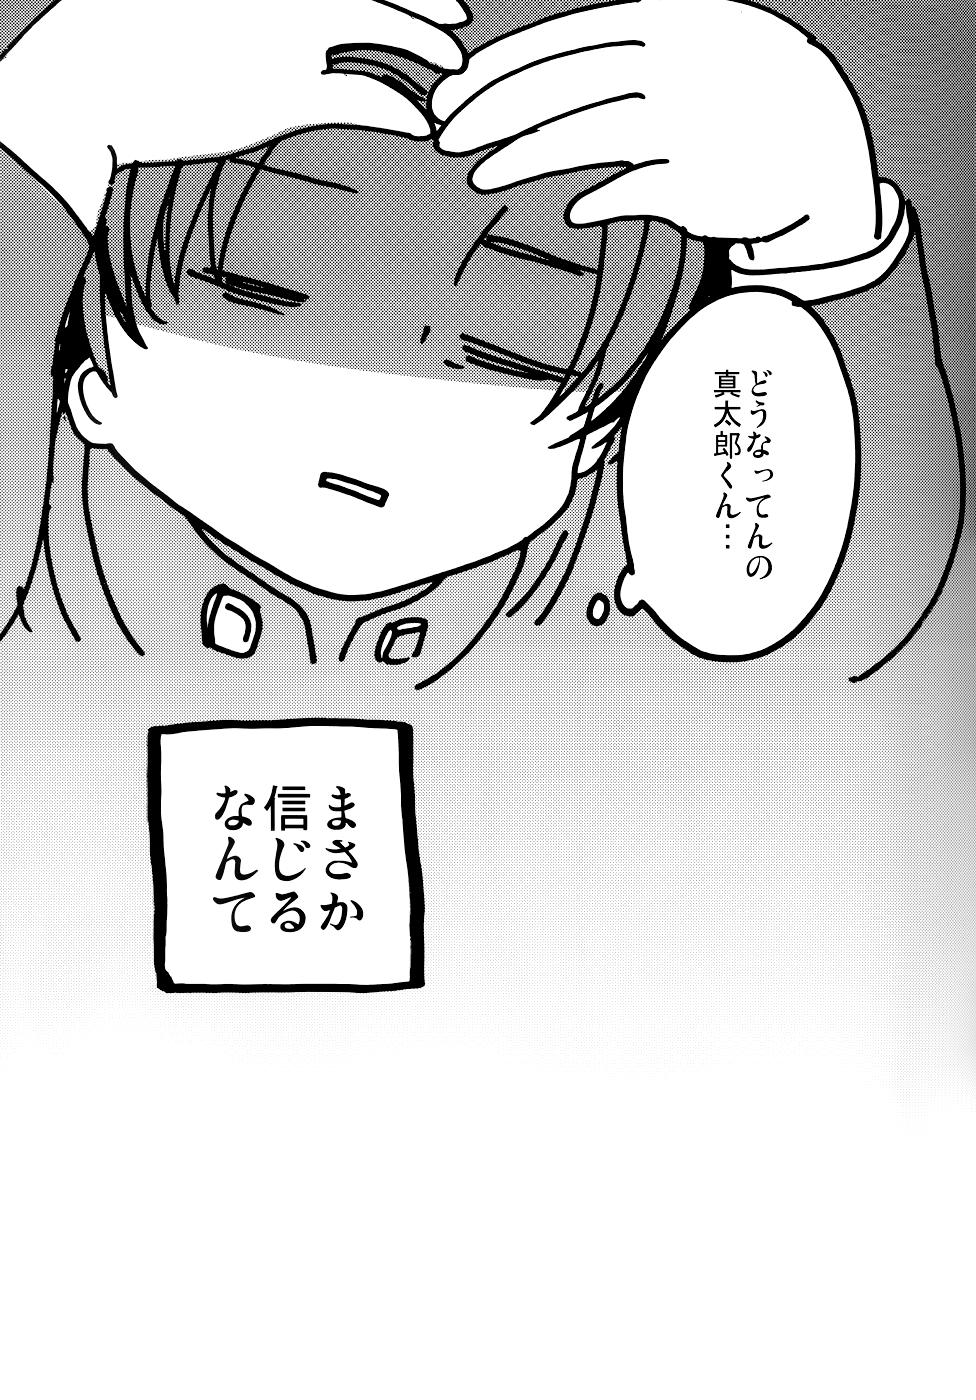 b_0005_05